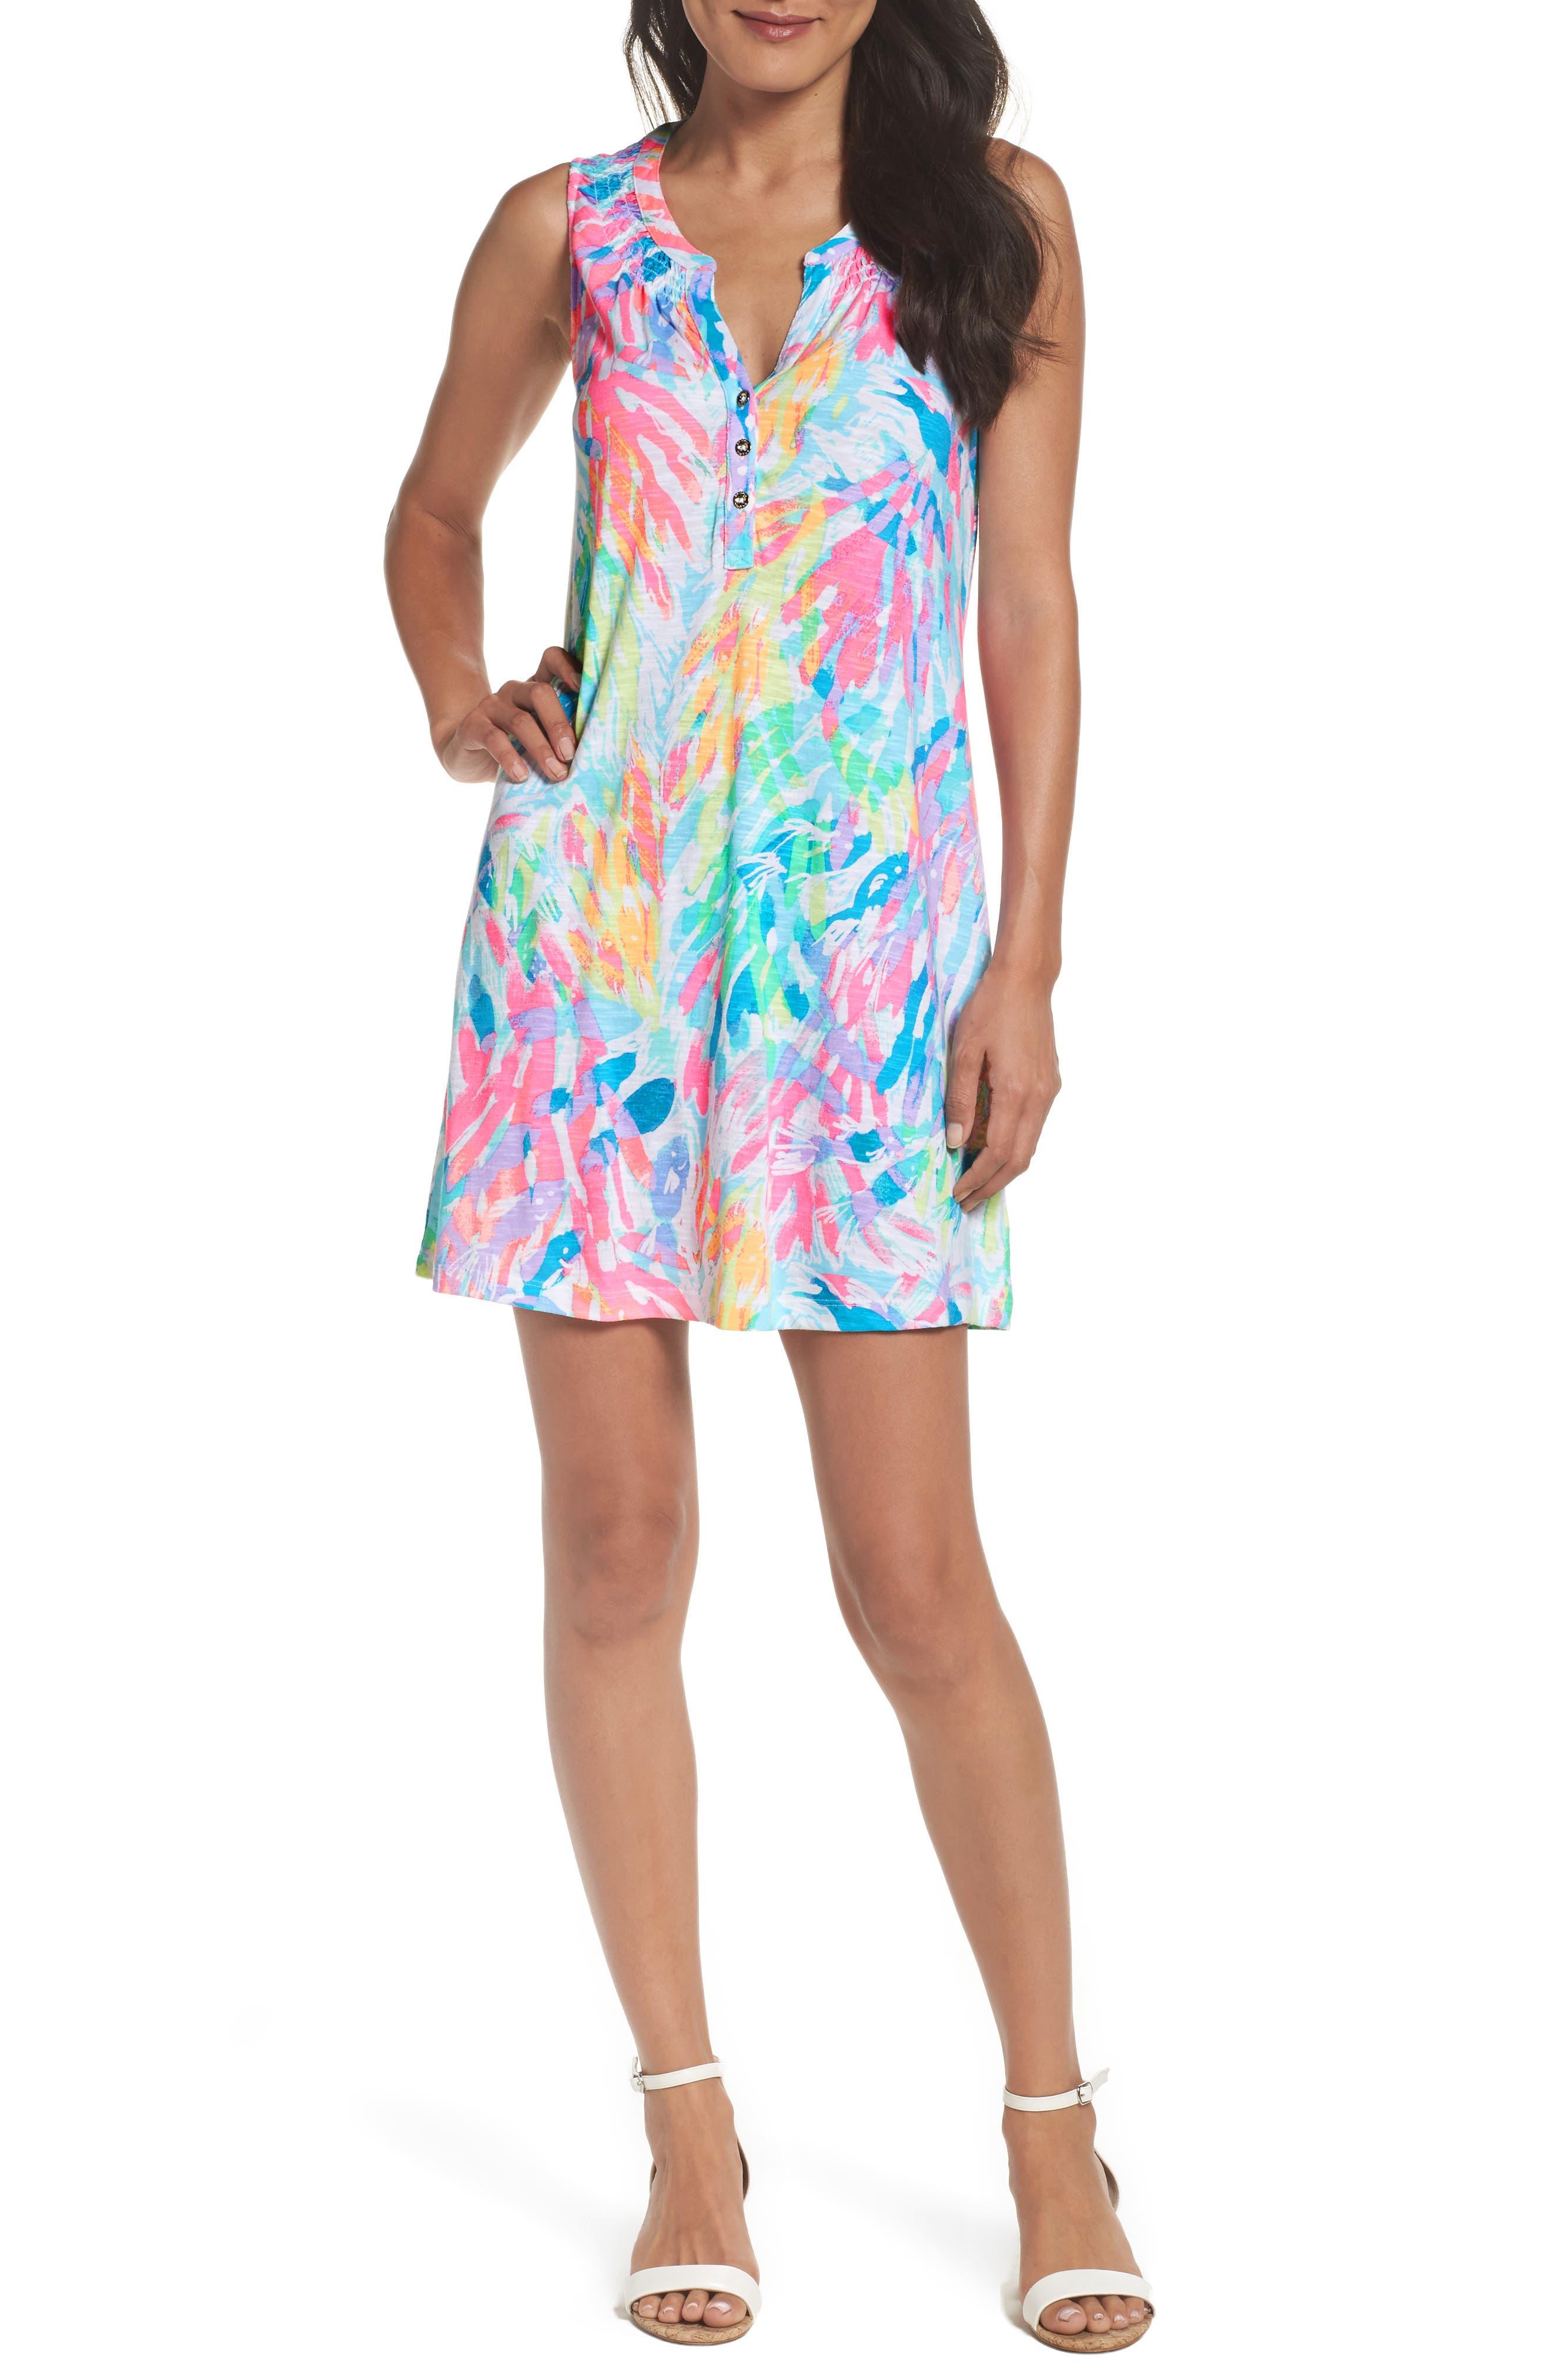 Main Image - Lilly Pulitzer® Essie Shift Dress